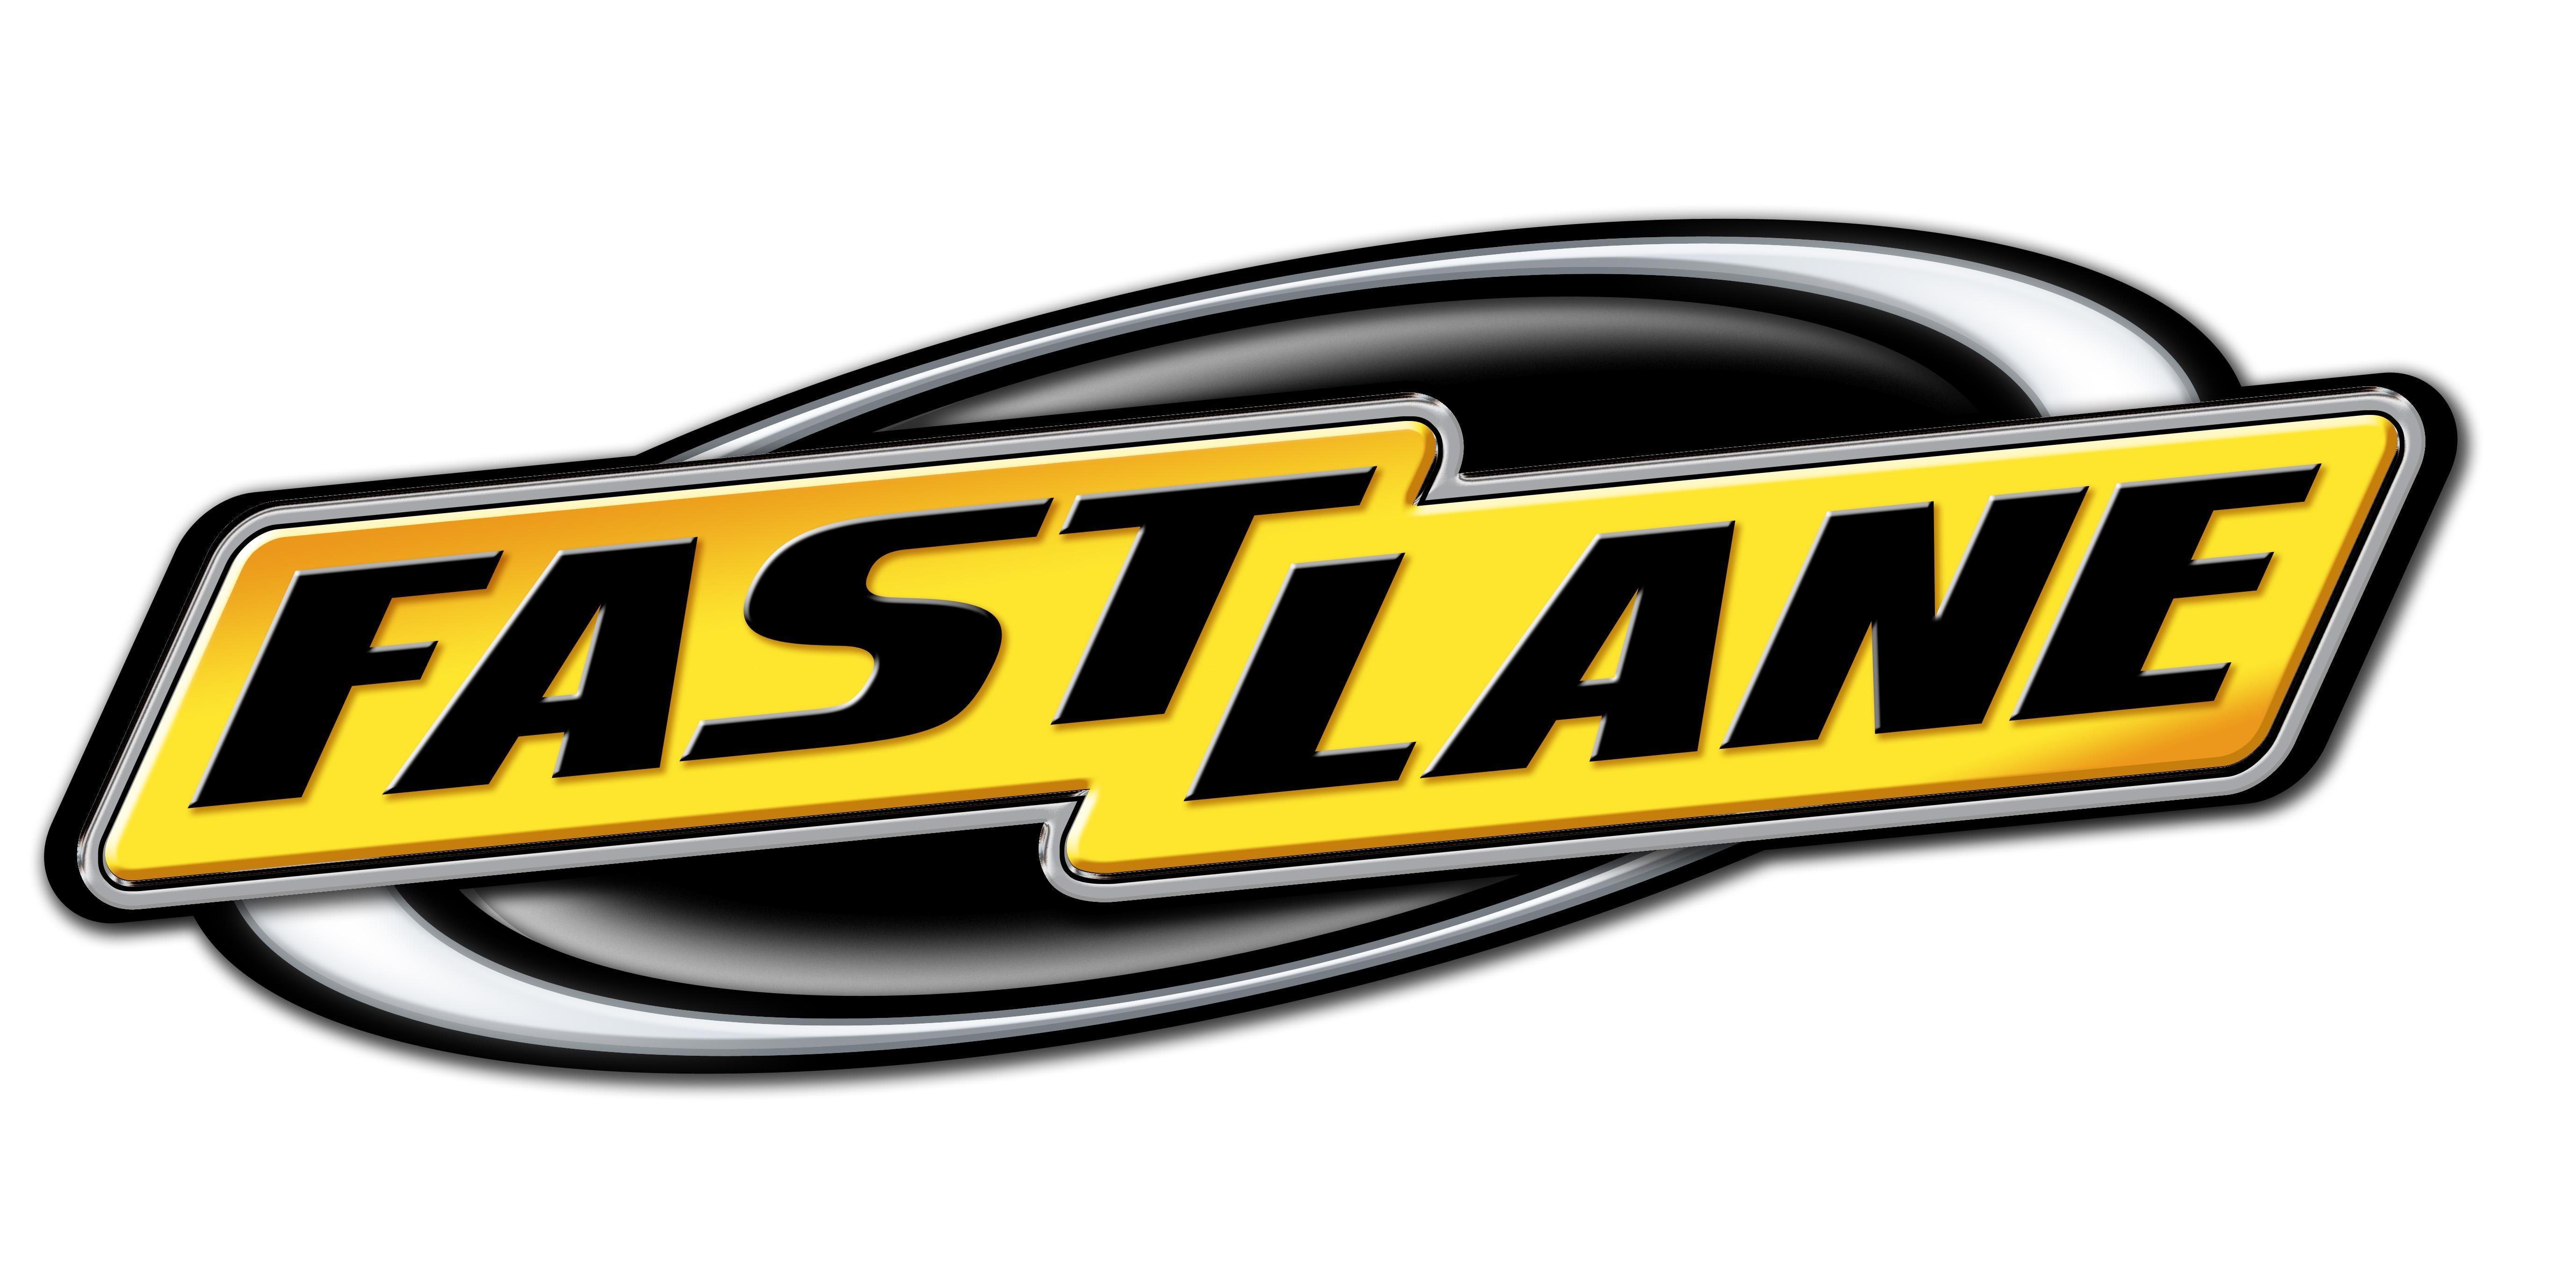 Fastlane | hobbyDB